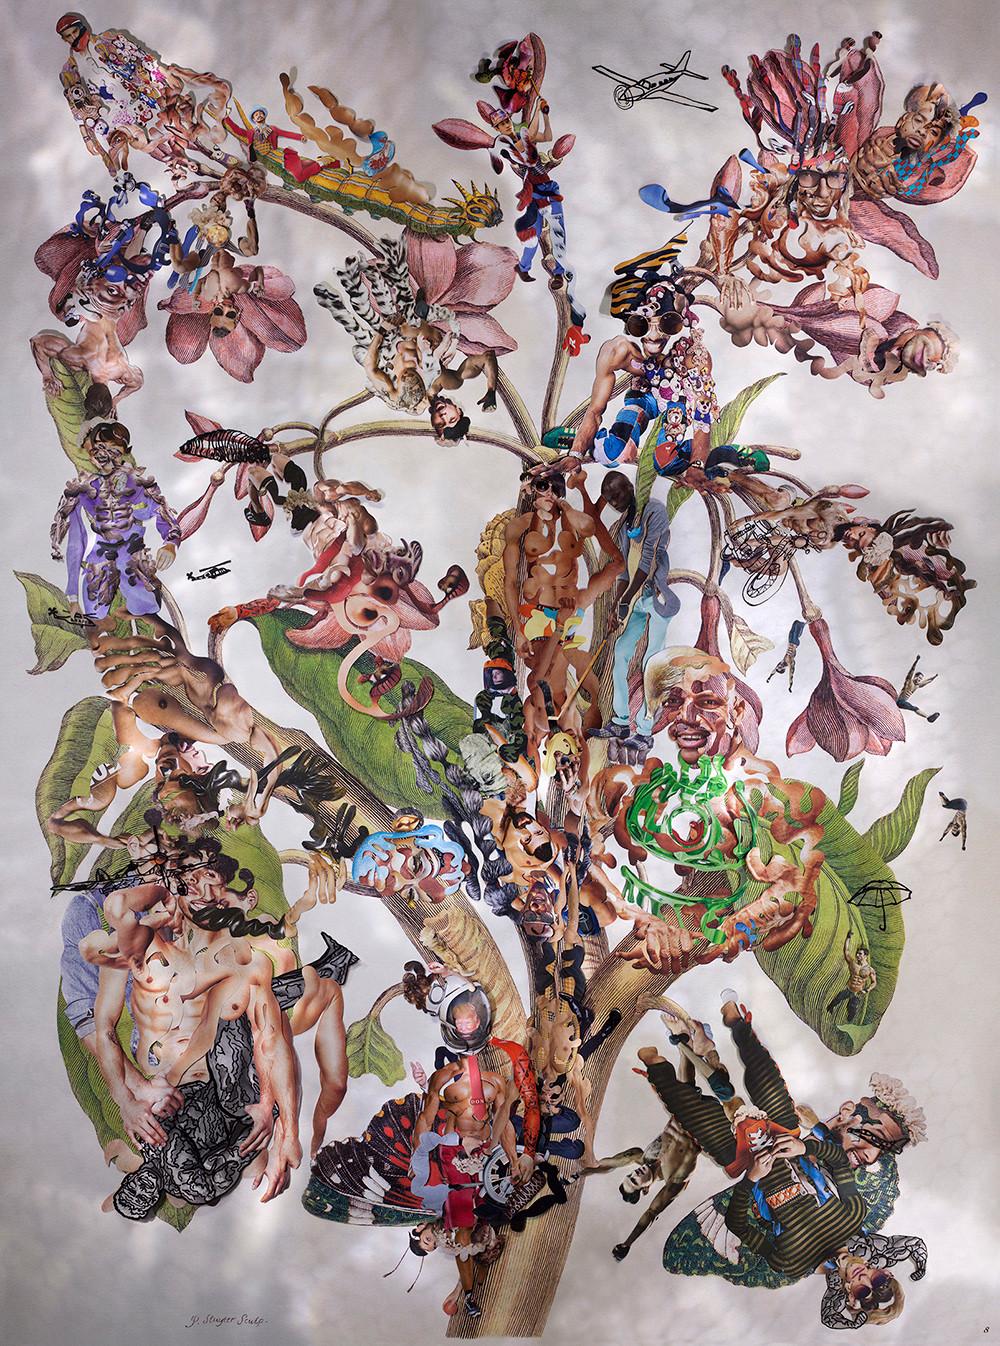 Dominique Paul, Insects of Suriname 23, 2014, ©© Dominique Paul, 198 x 147 cm, Archival pigment print, Œuvre exposée par : MIYAKO YOSHINAGA